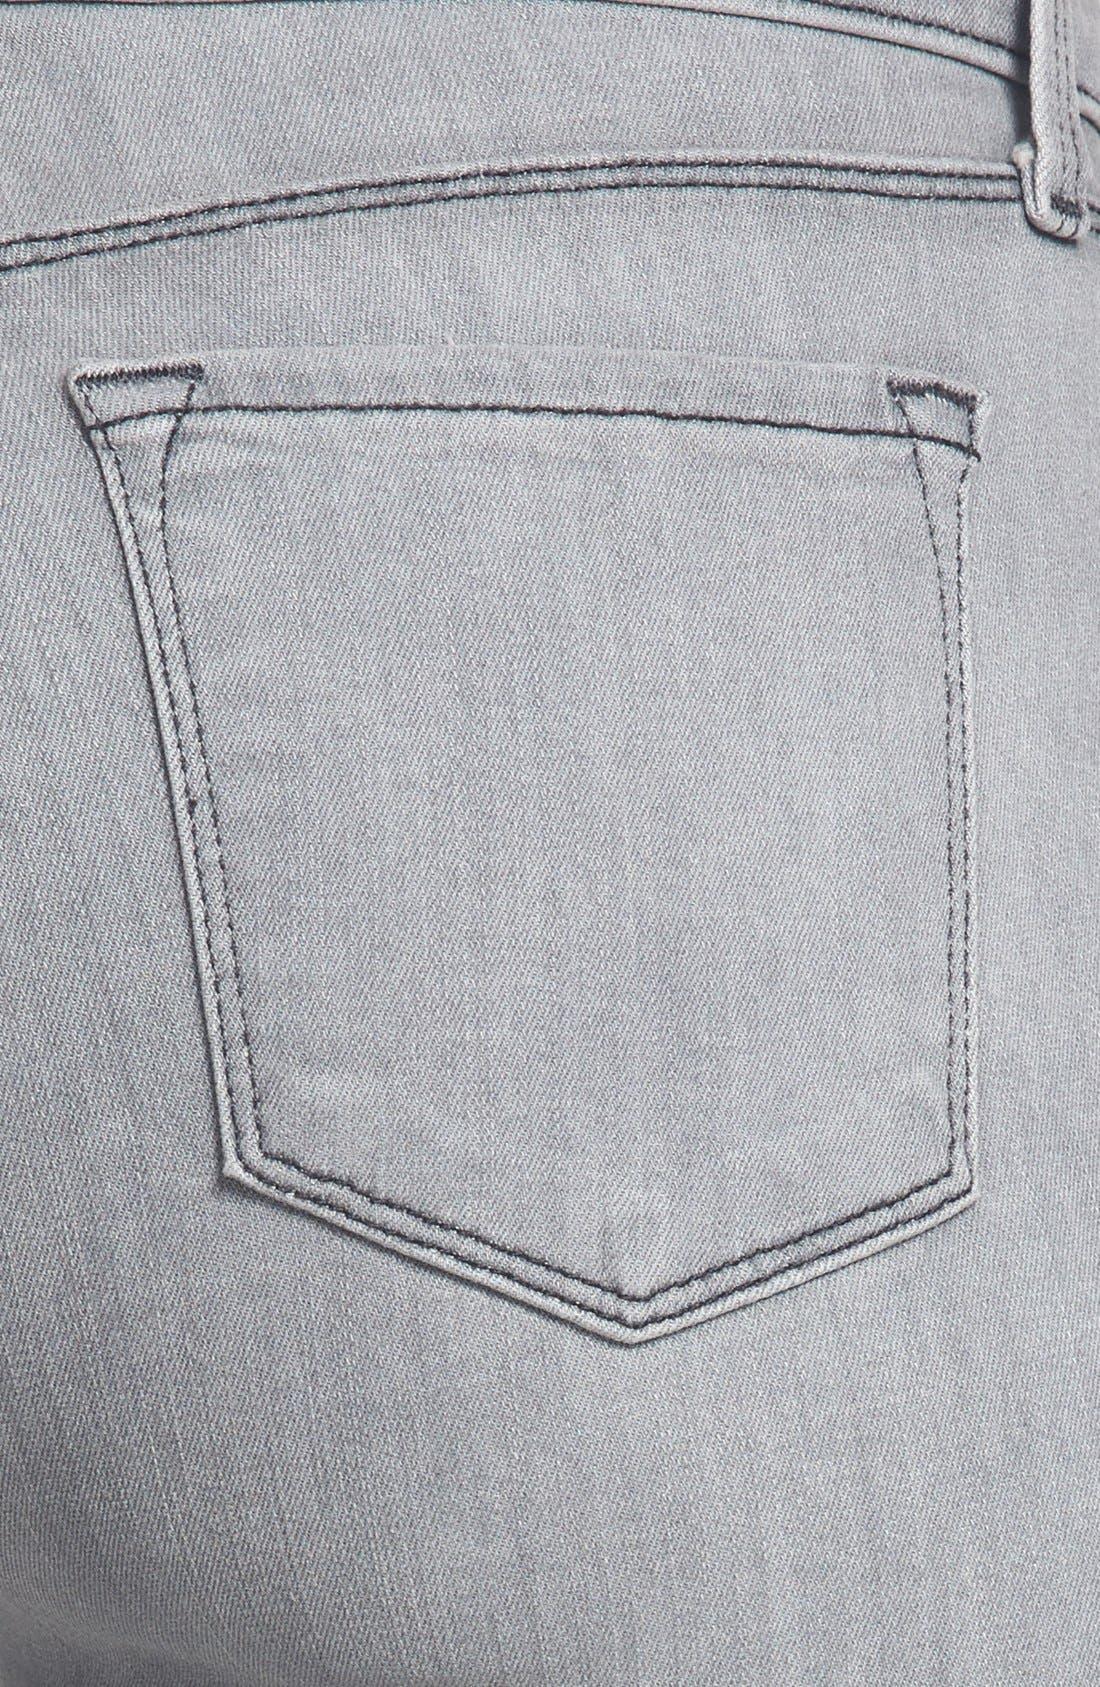 '620' Mid Rise Skinny Jeans,                             Alternate thumbnail 10, color,